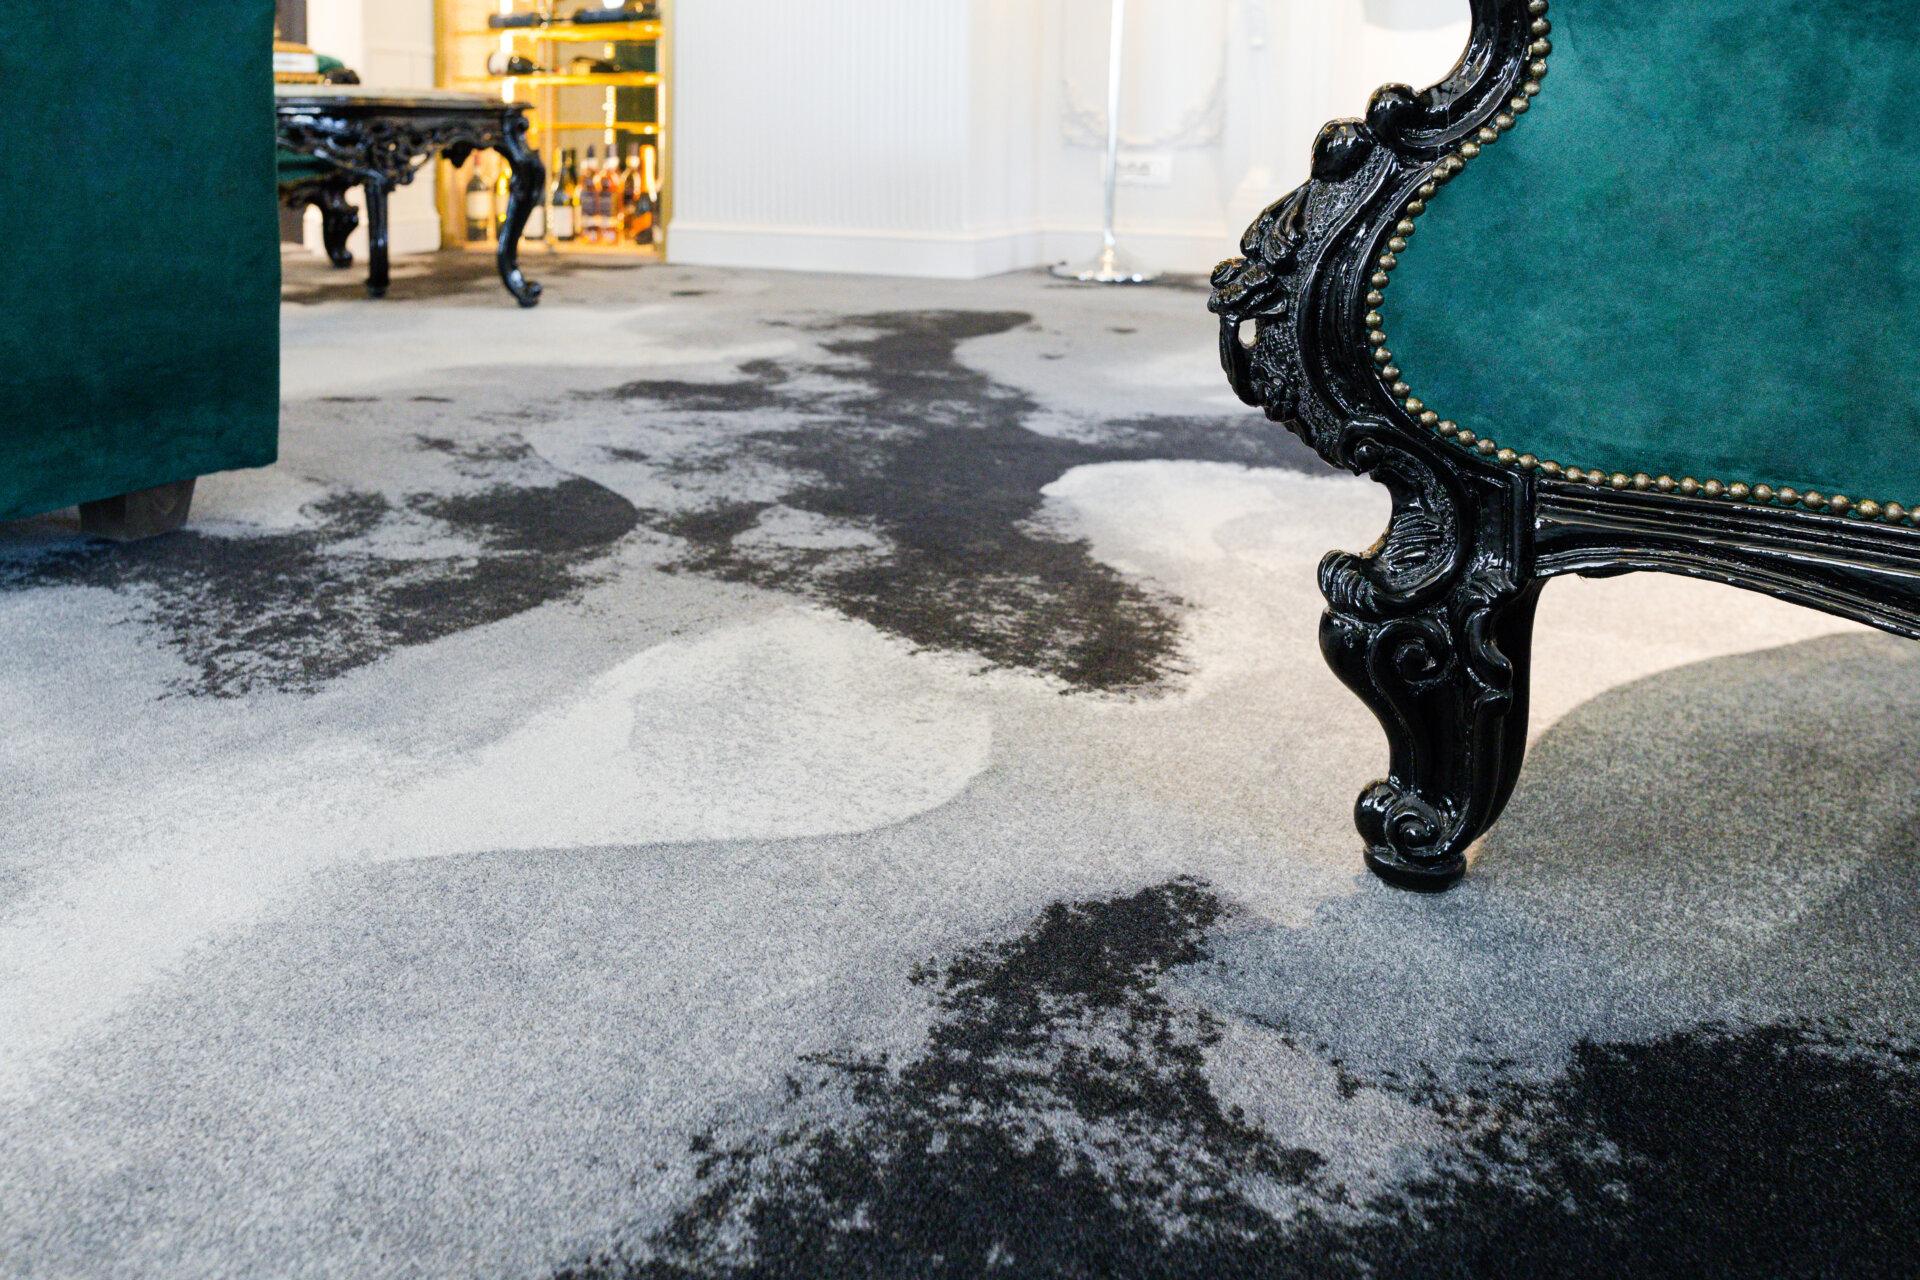 20210303-carpet&more-hotel-rocca-craiovaby-hugmedia-06